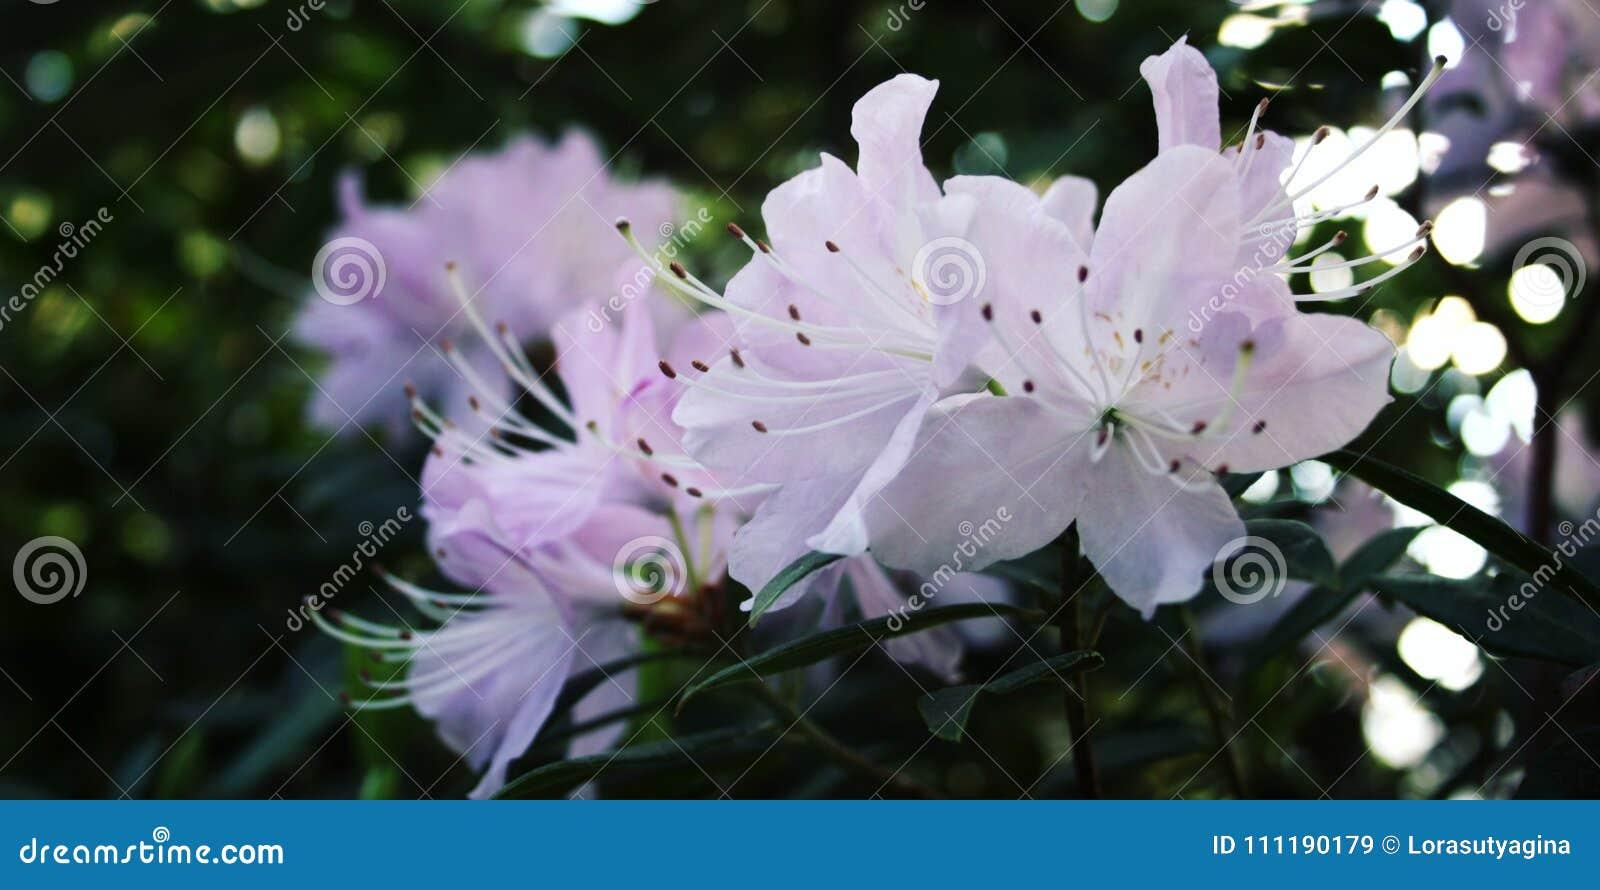 Lilac Azalia Flowers Bloom In Spring Season Stock Image Image Of